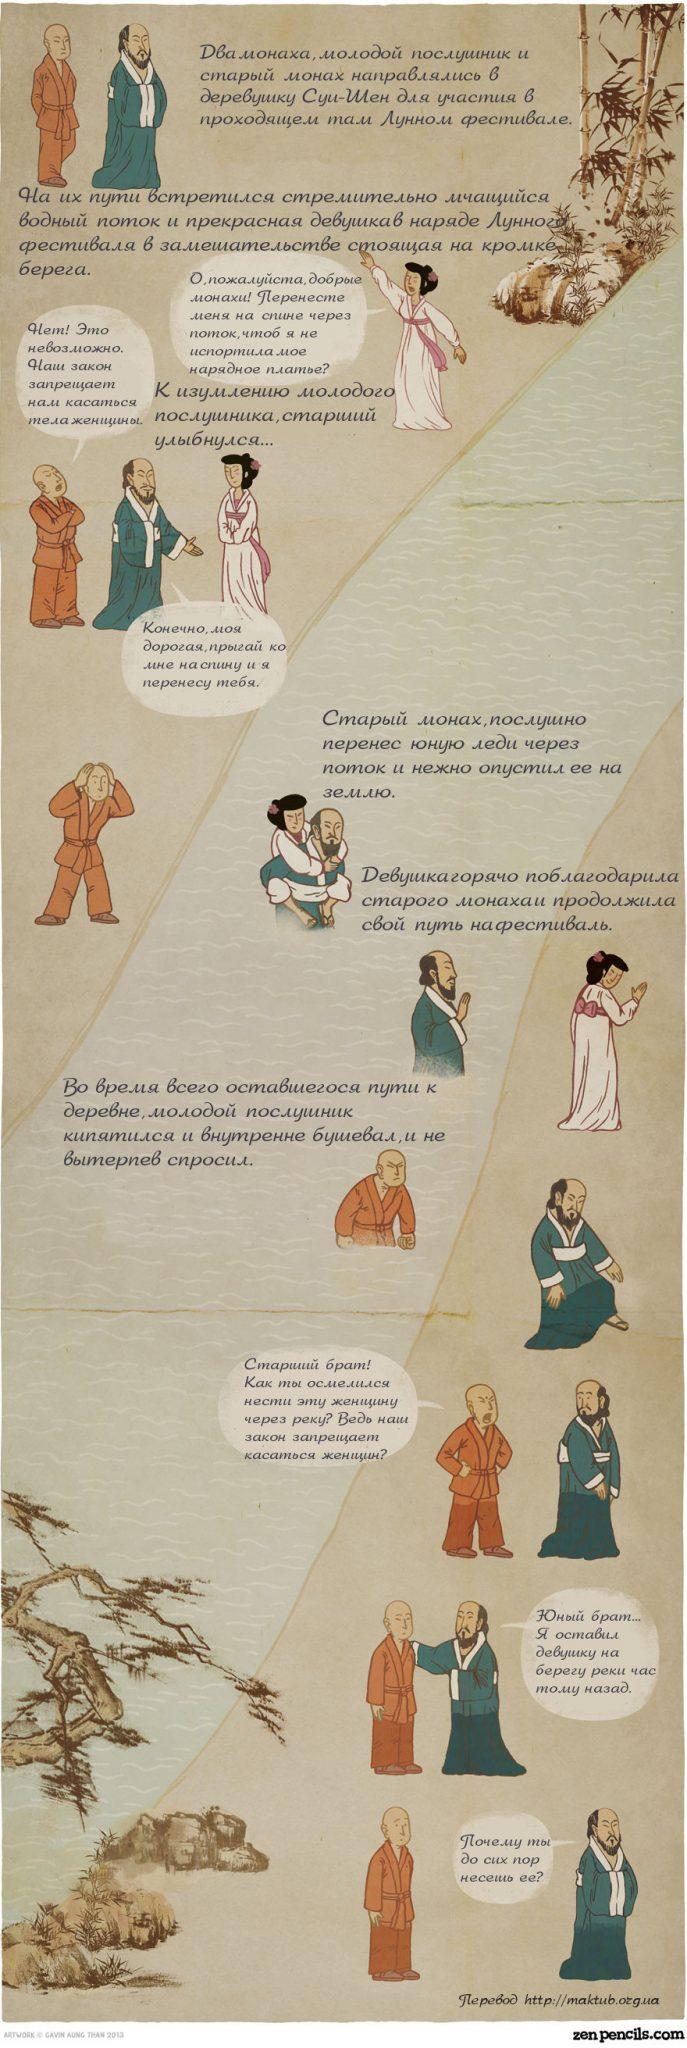 Два монаха и женщина